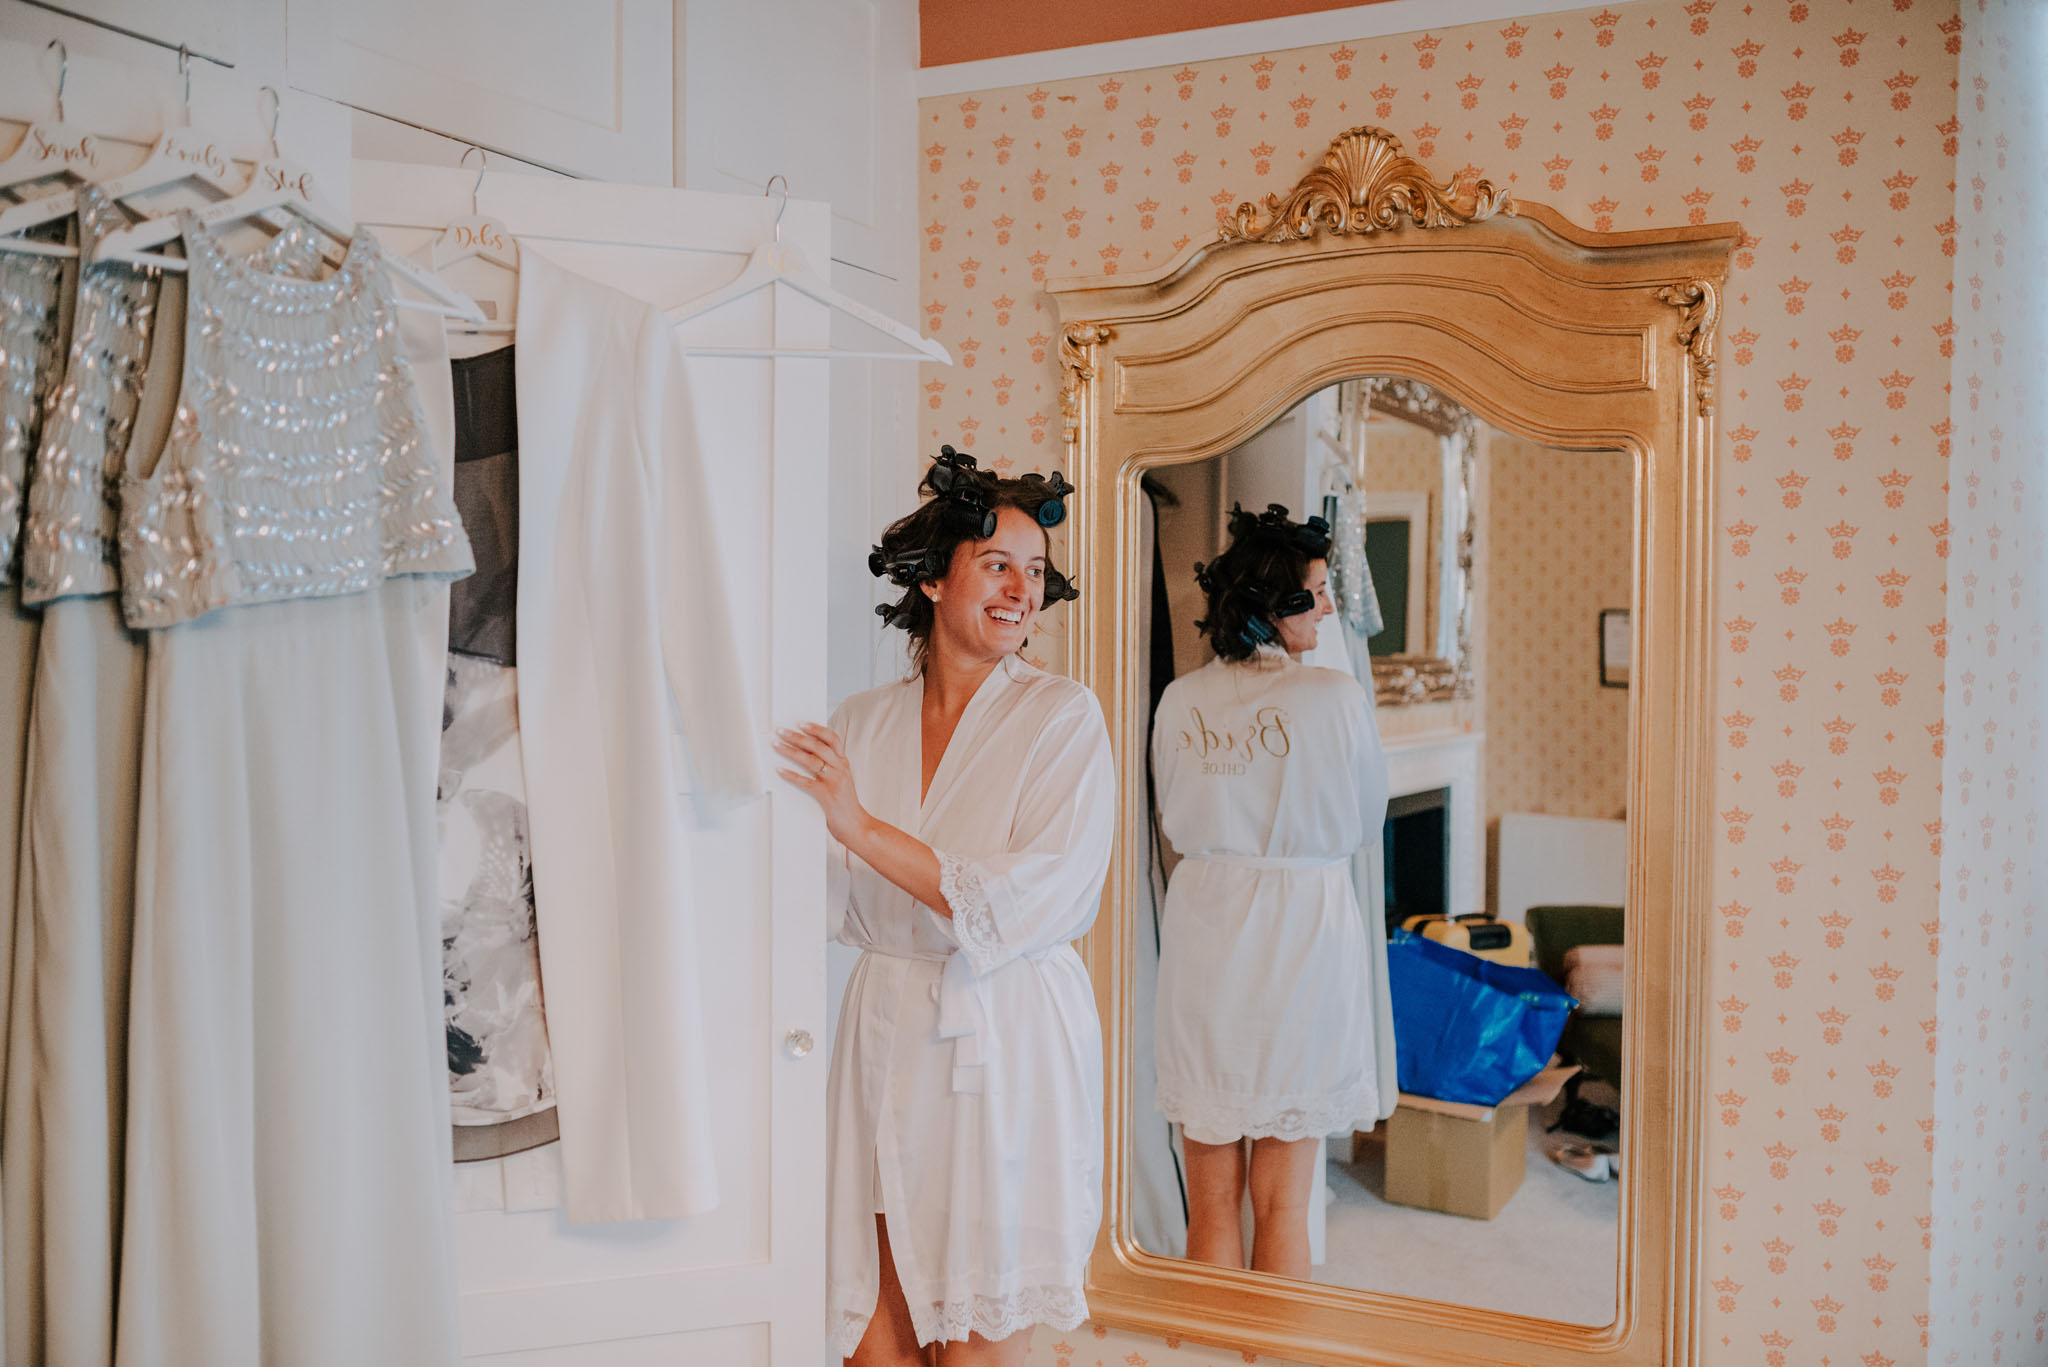 wedding-photographer-glewstone-court-hereford-scott-stockwell-photography012.jpg